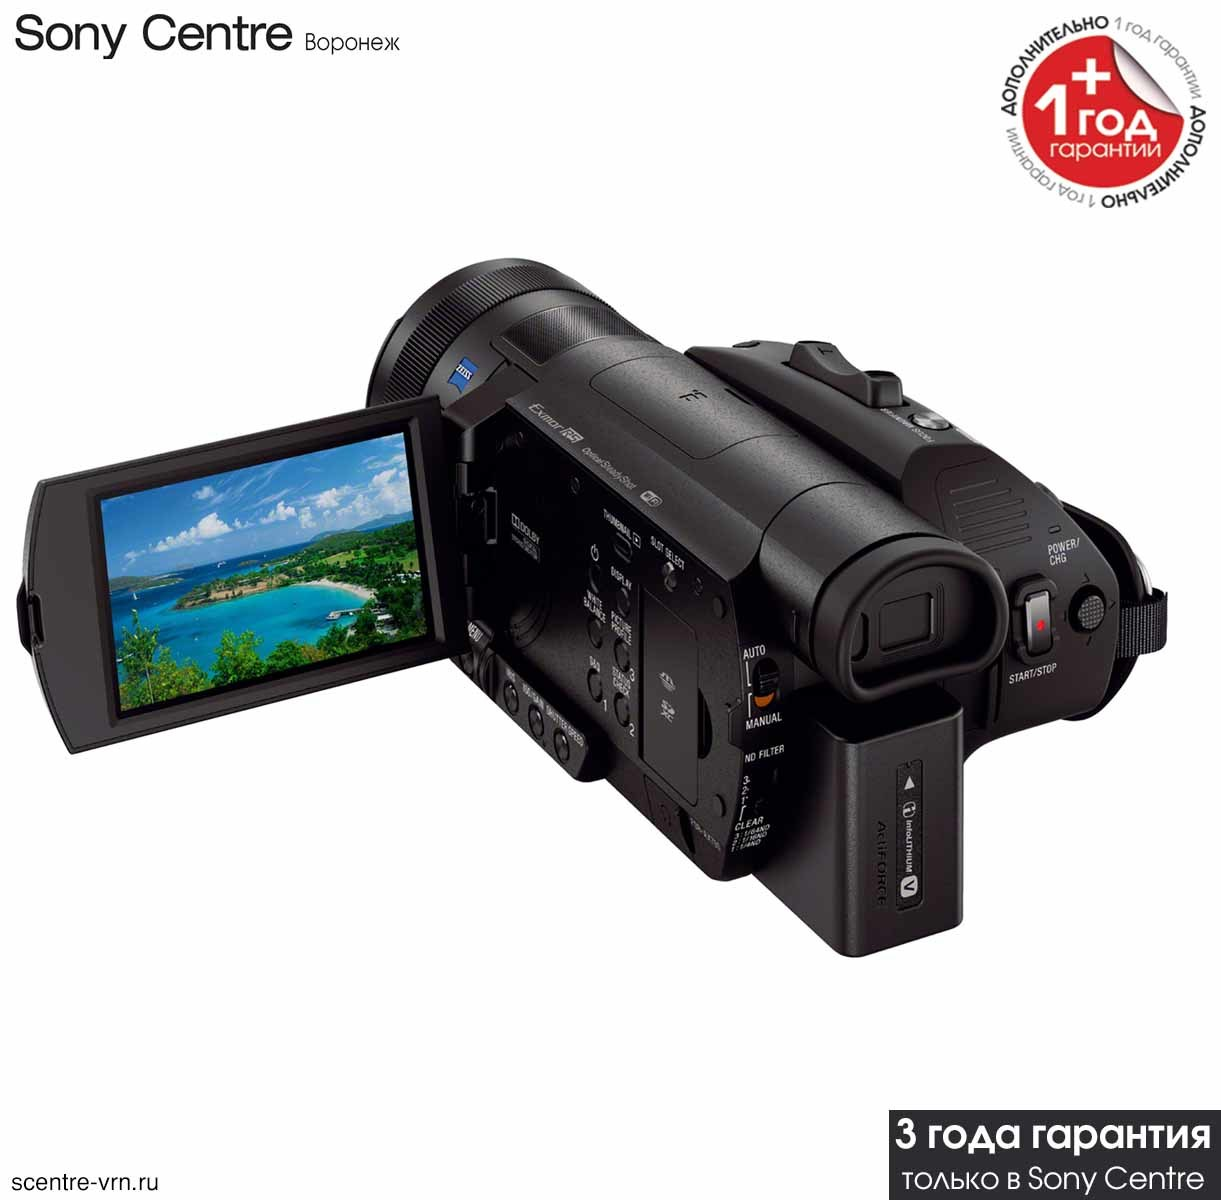 4K видеокамера Sony Handycam FDR-AX700 в Sony Centre Воронеж